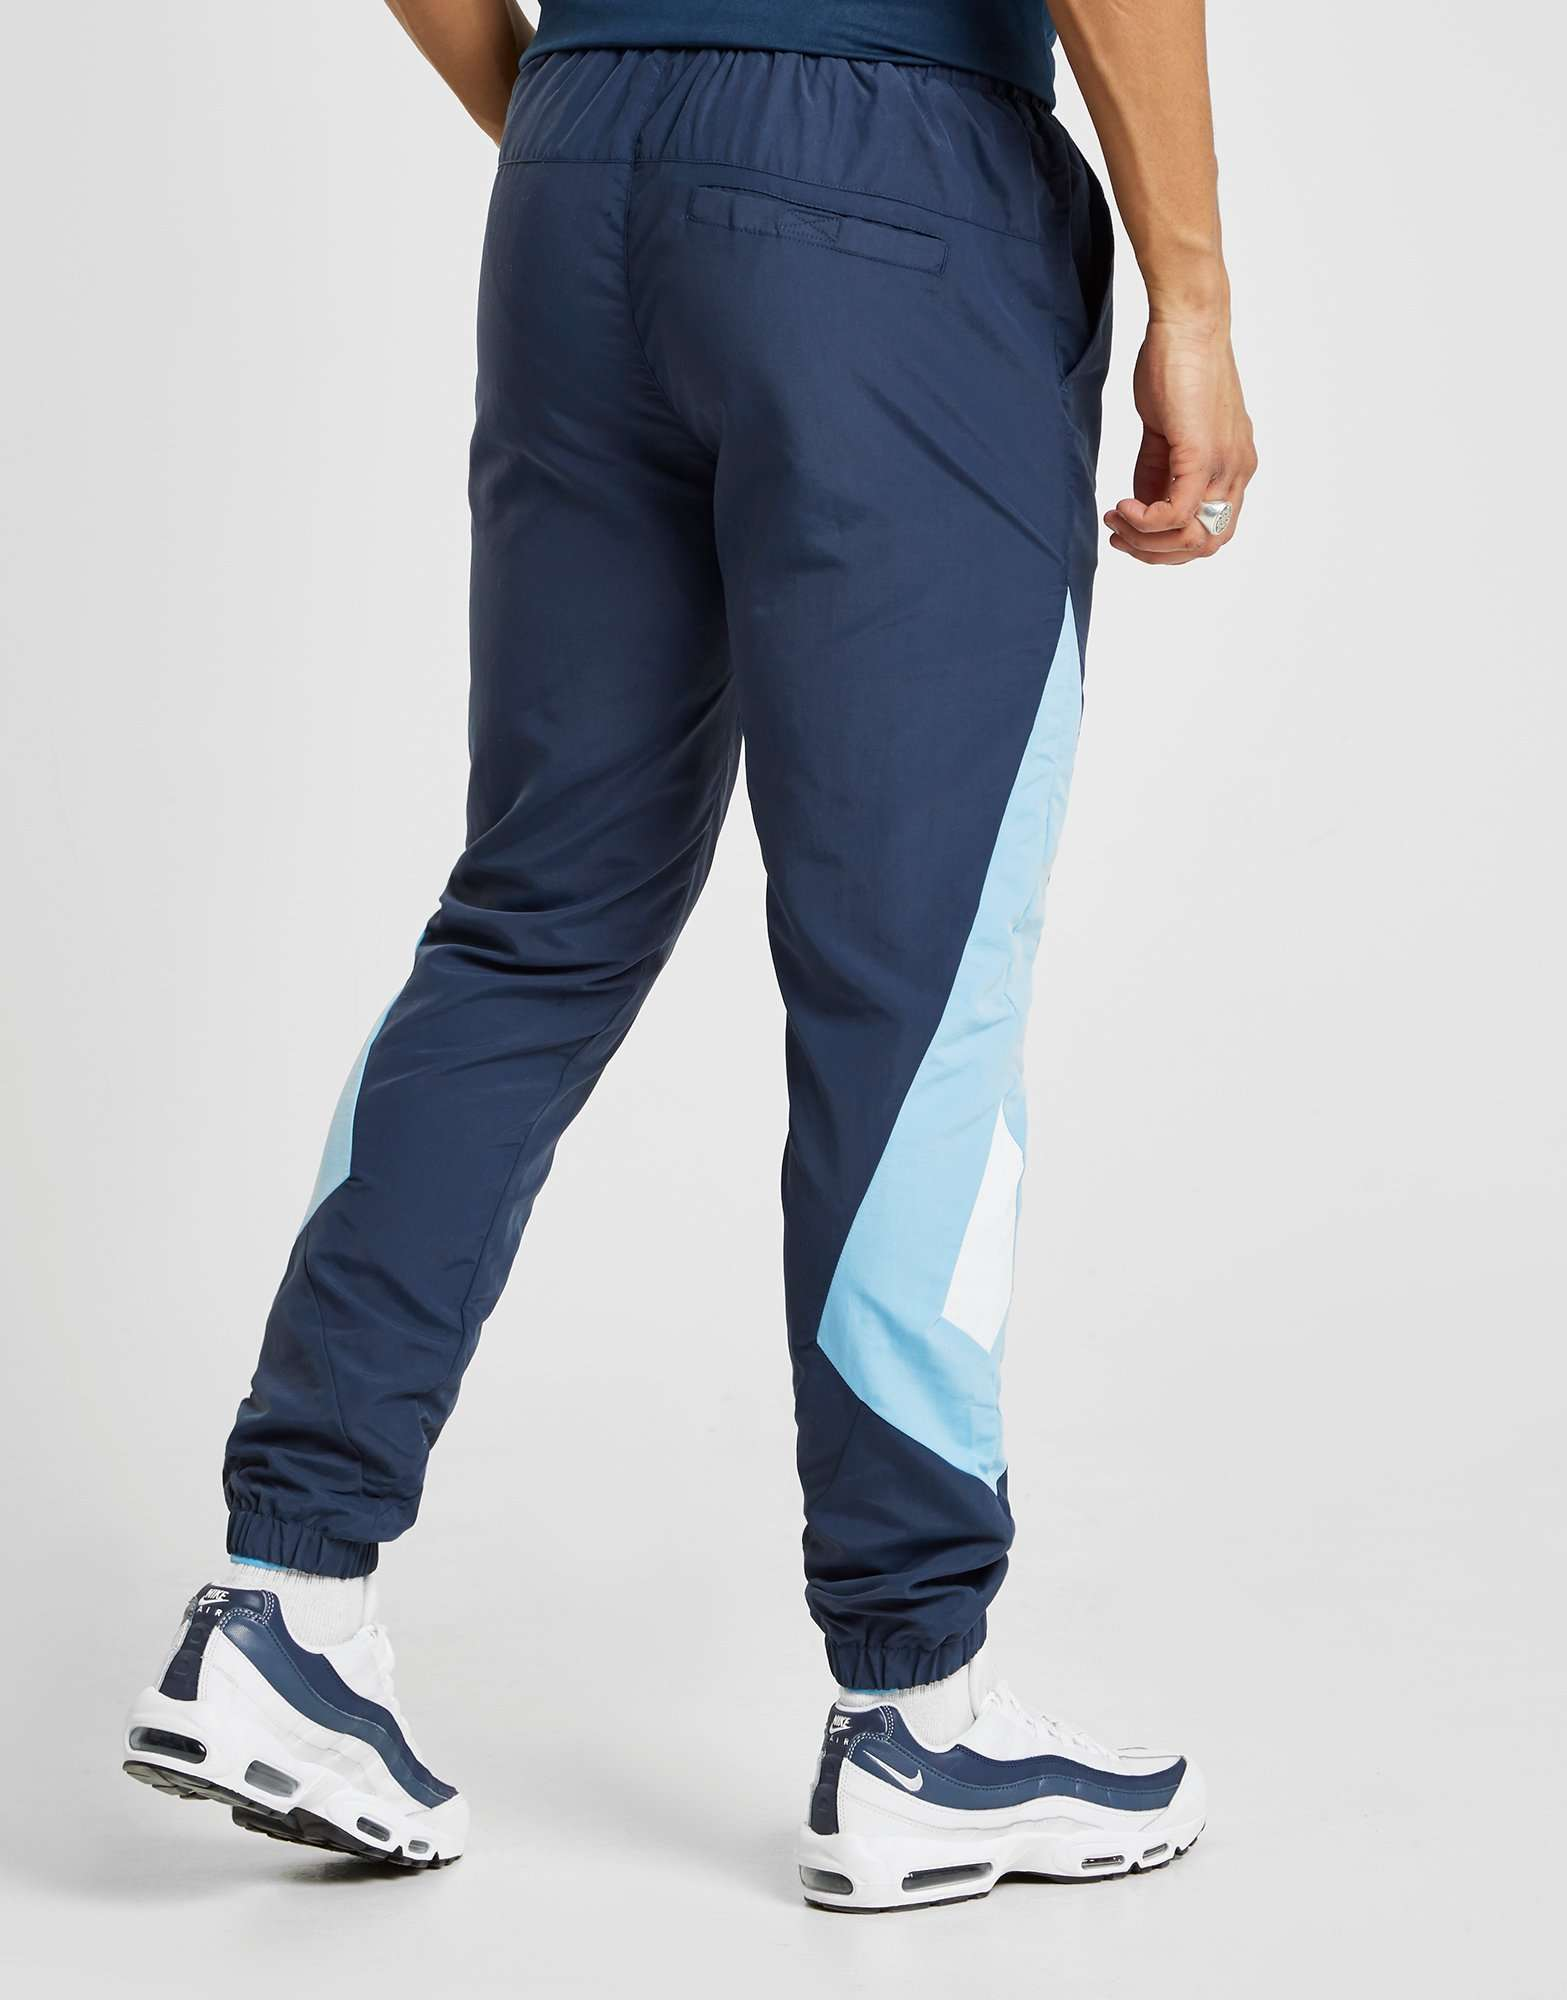 Ellesse Olmo Woven Track Pants